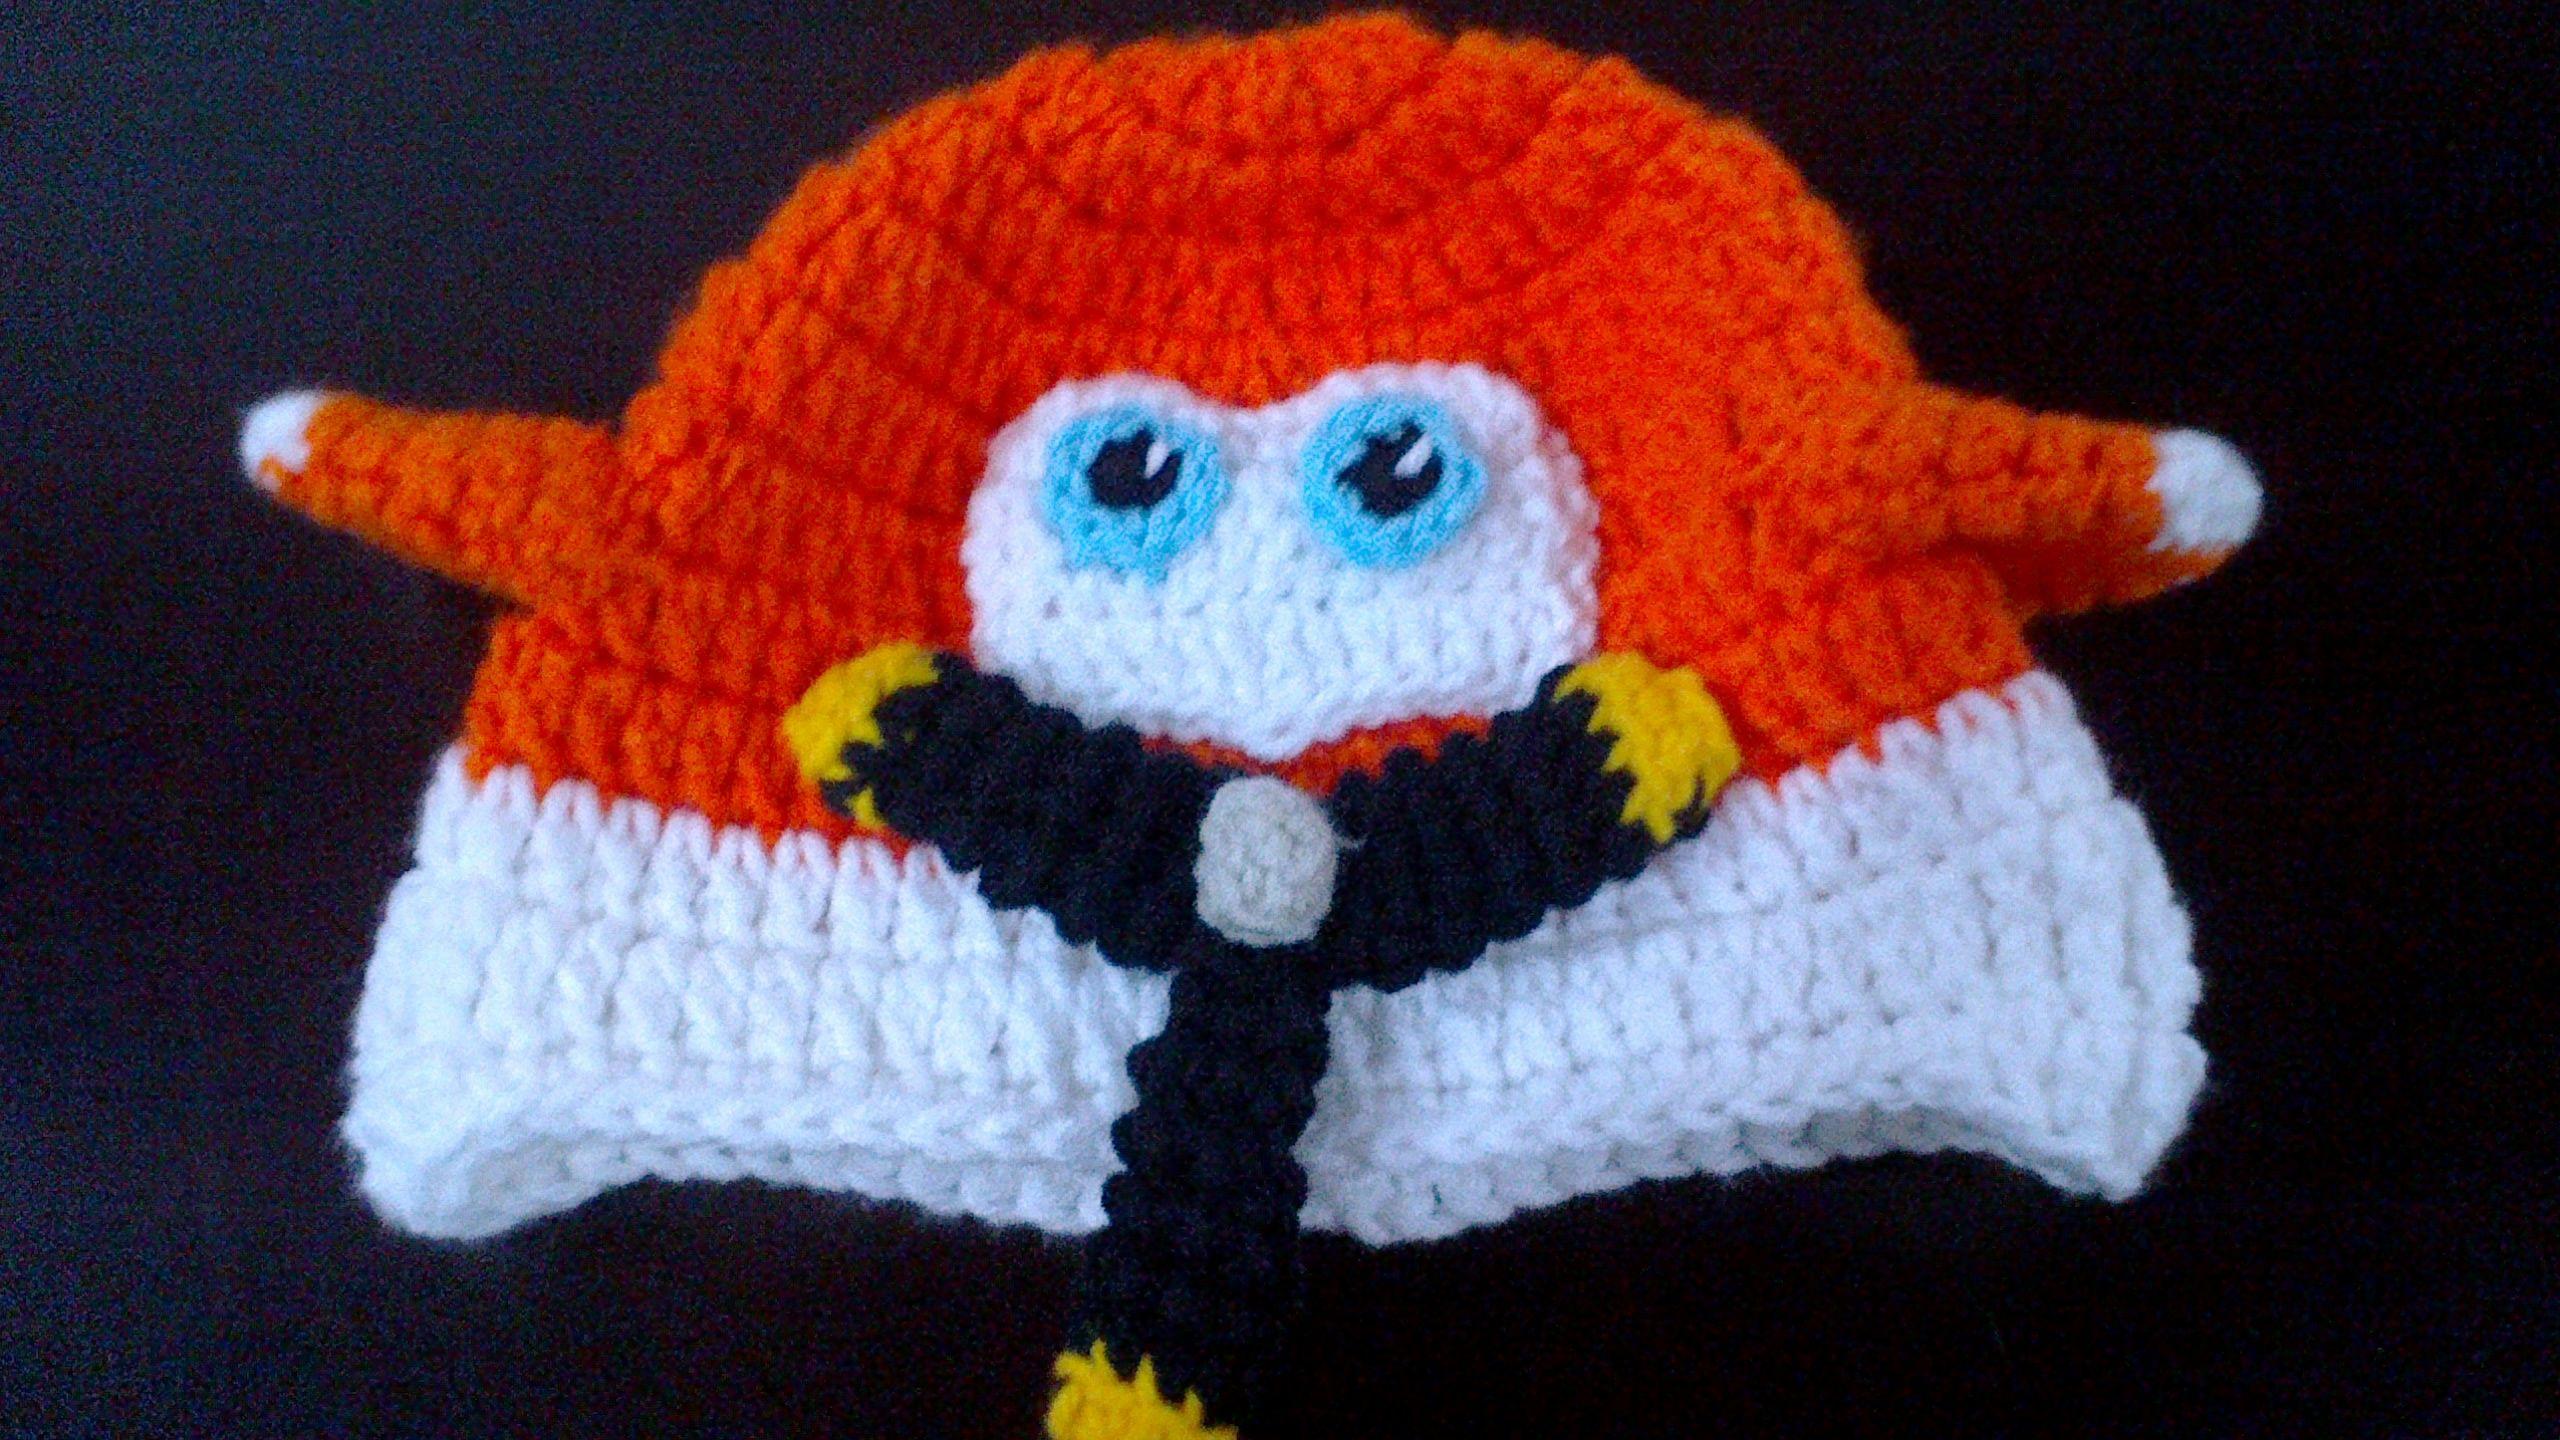 Gorro Avion a crochet